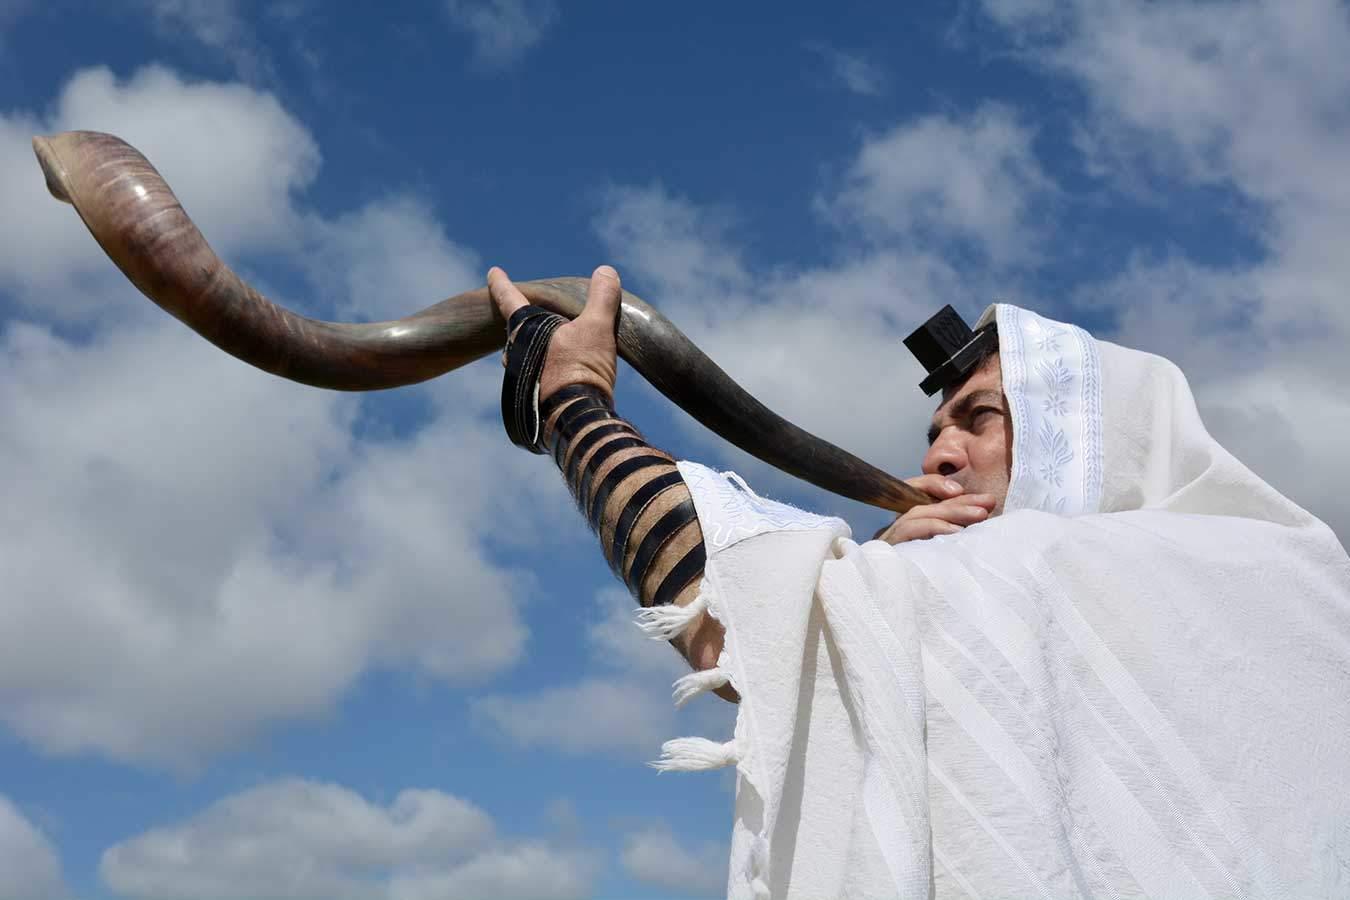 Blowing the Shofar (Image: Bigstock)